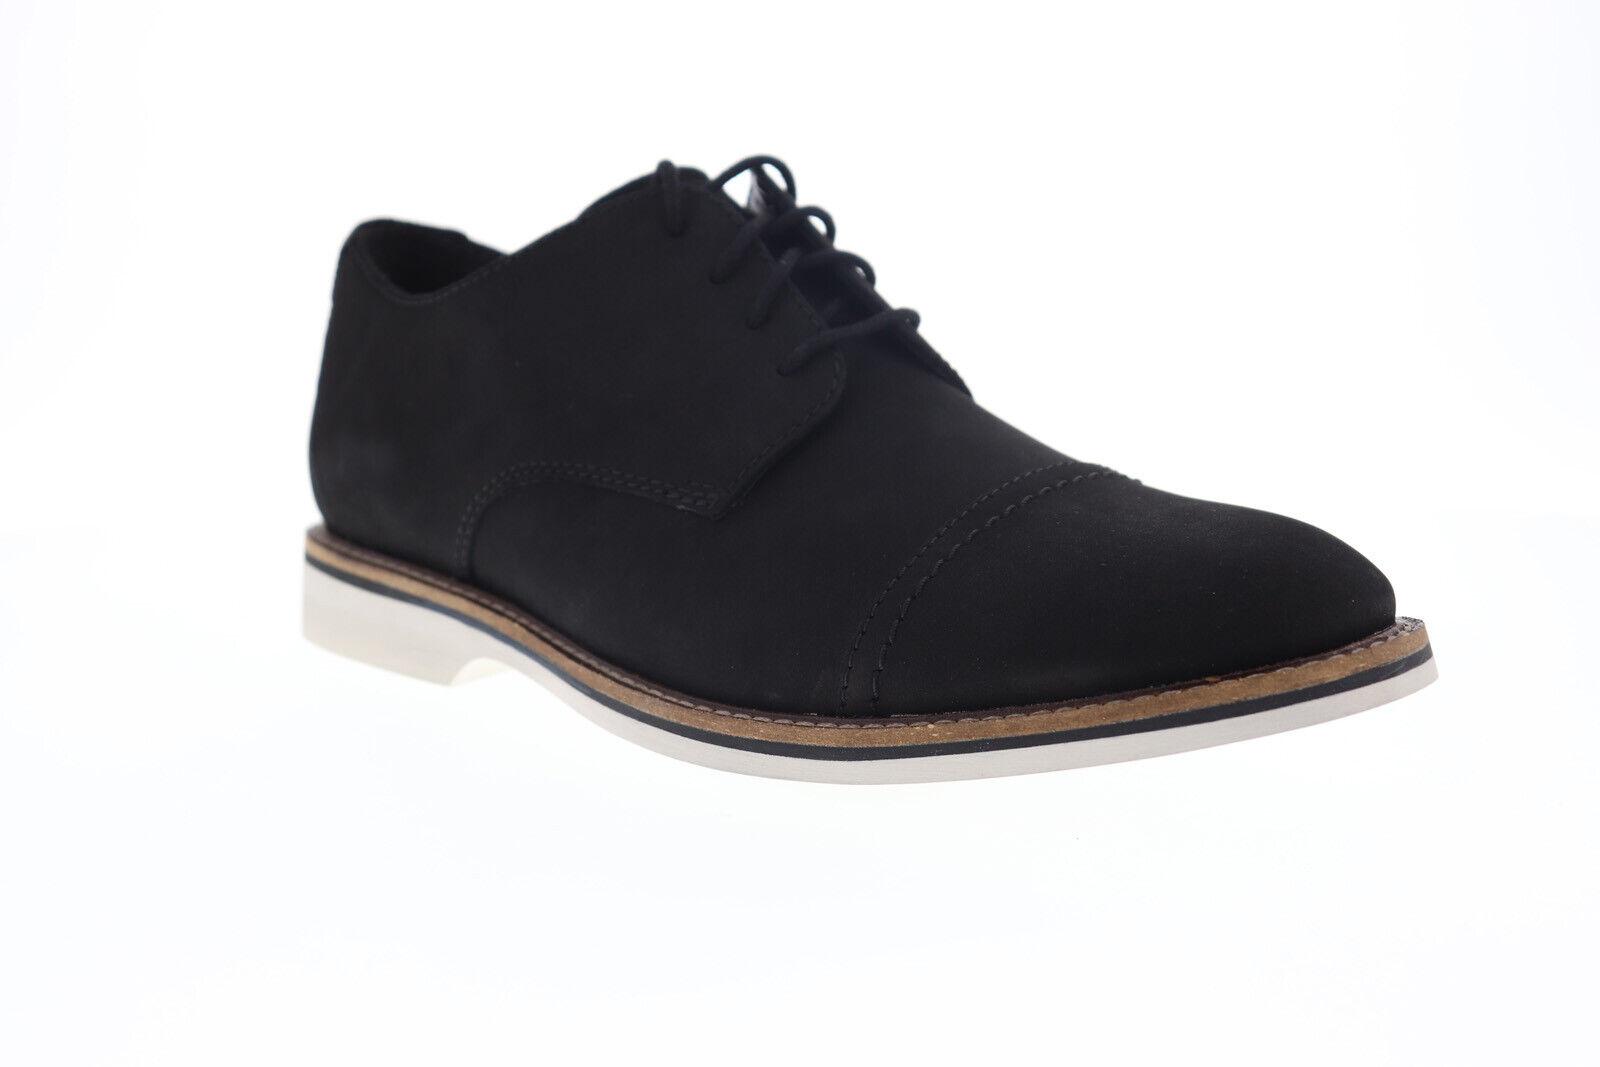 Clarks Mens James Cap - Black Leather 9